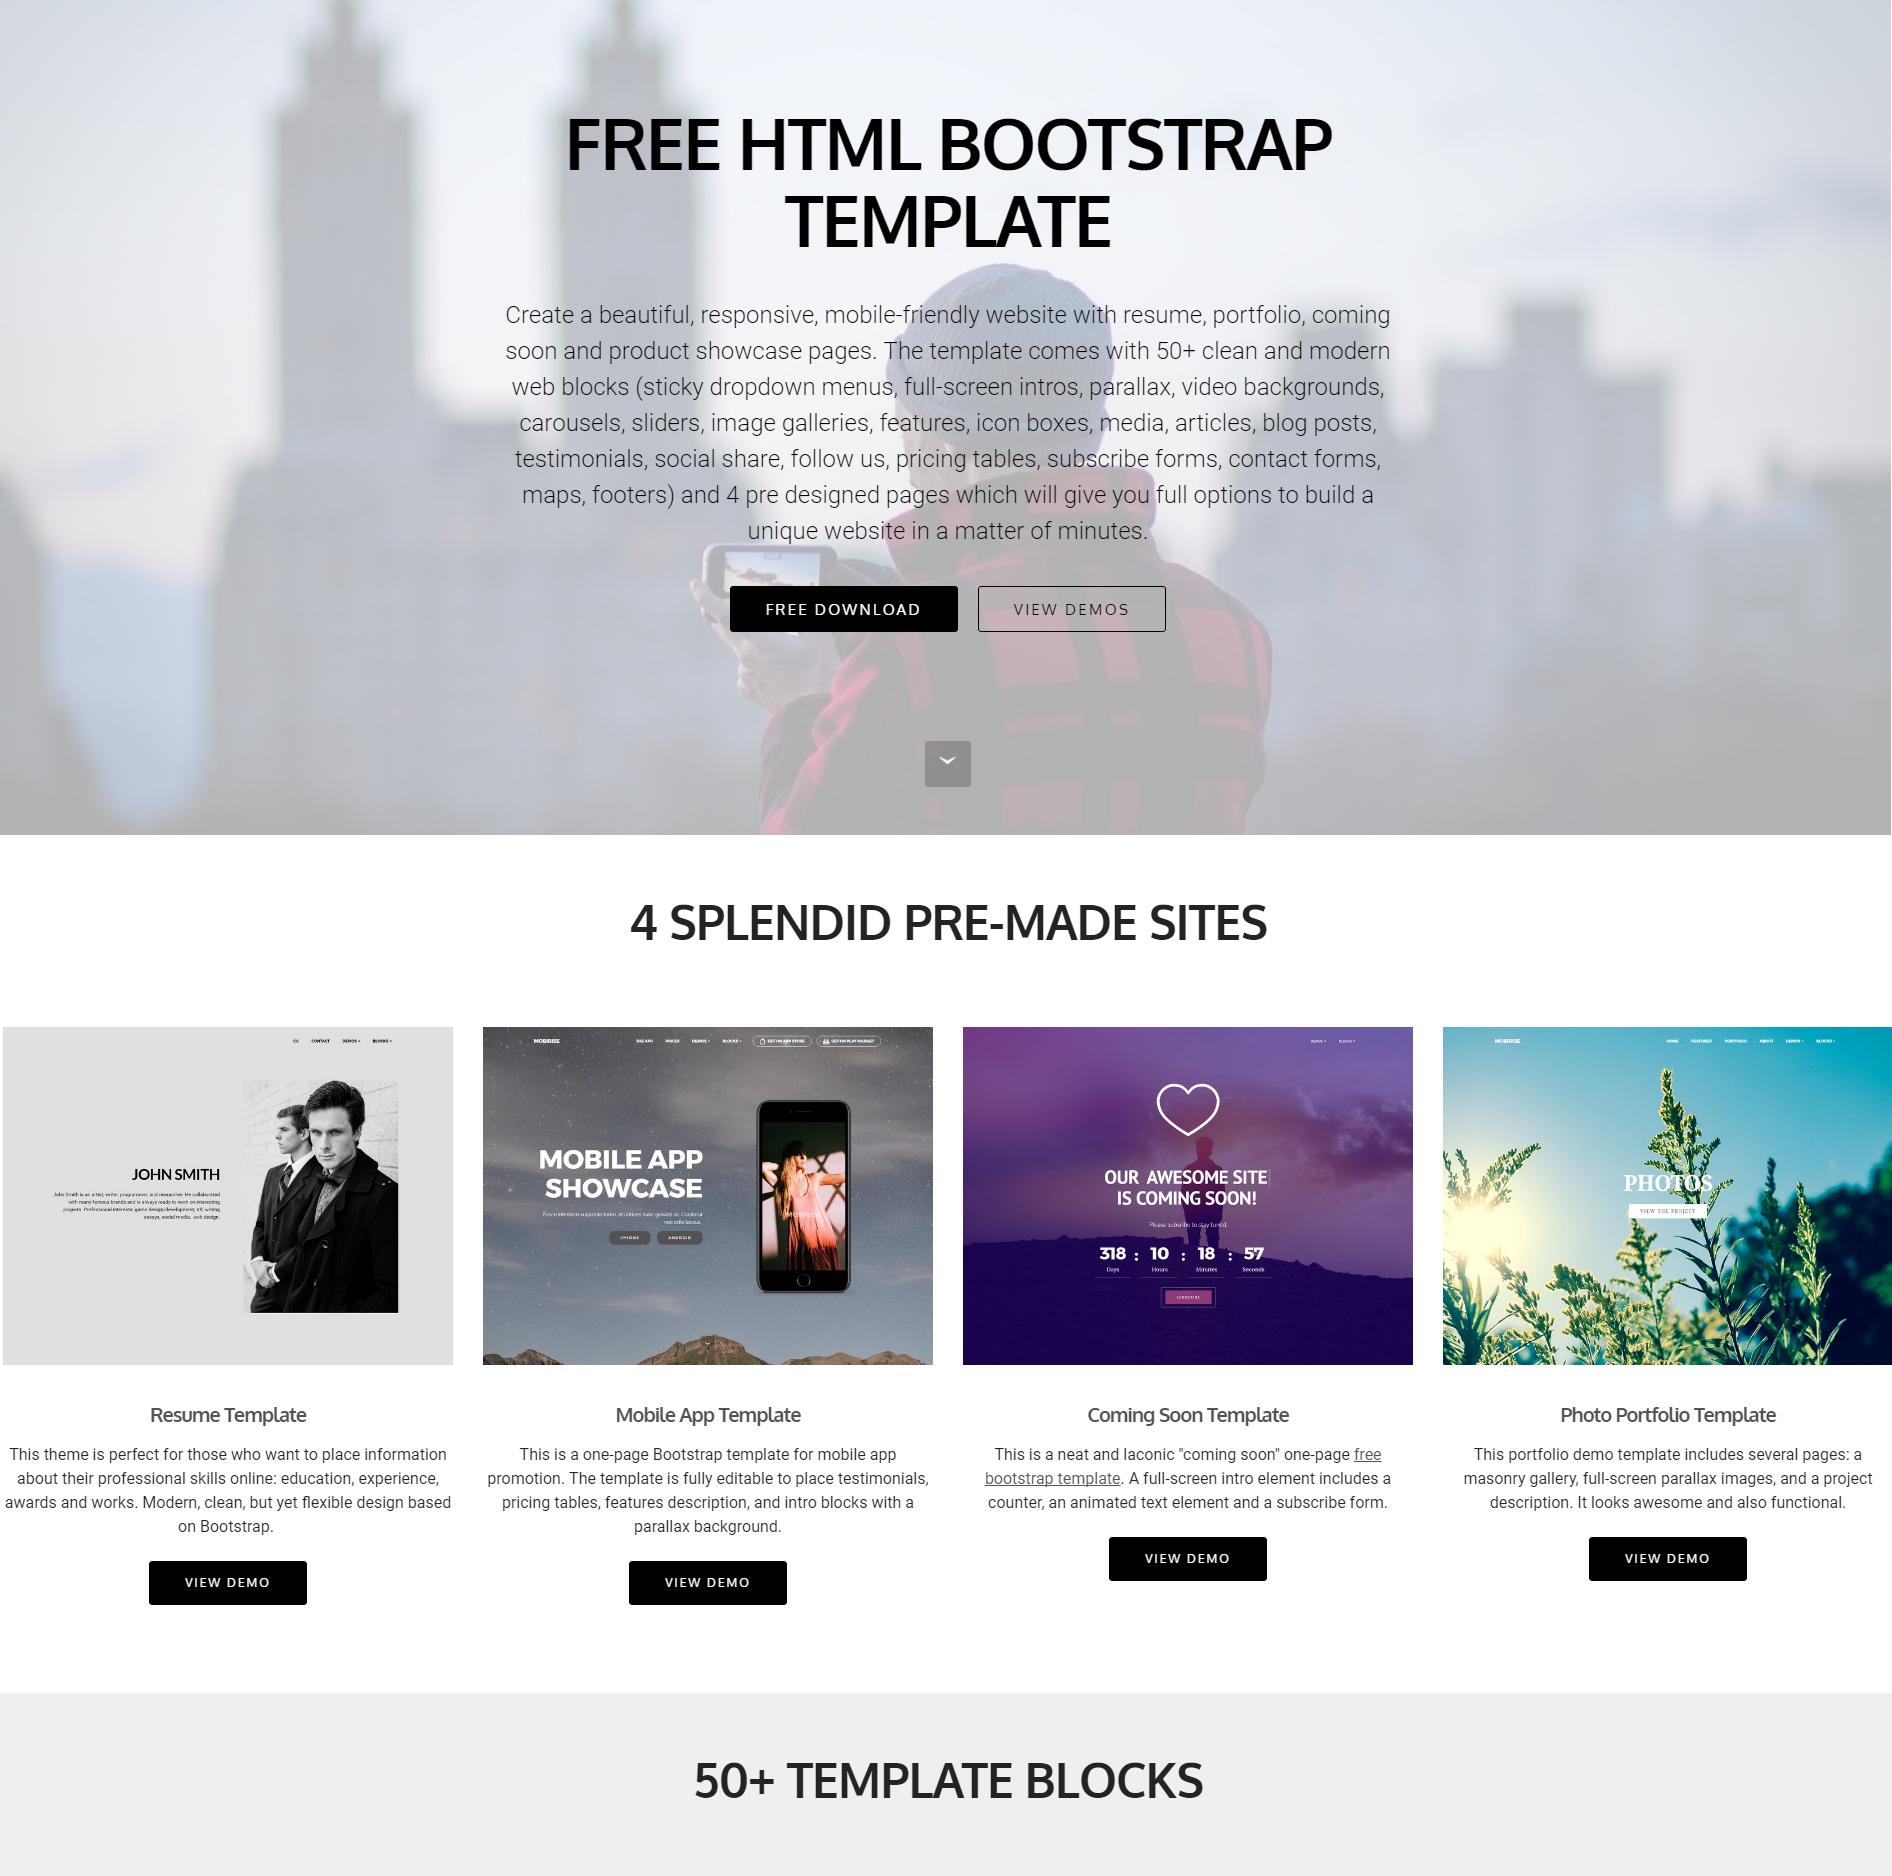 HTML Bootstrap 4 Blocks Themes